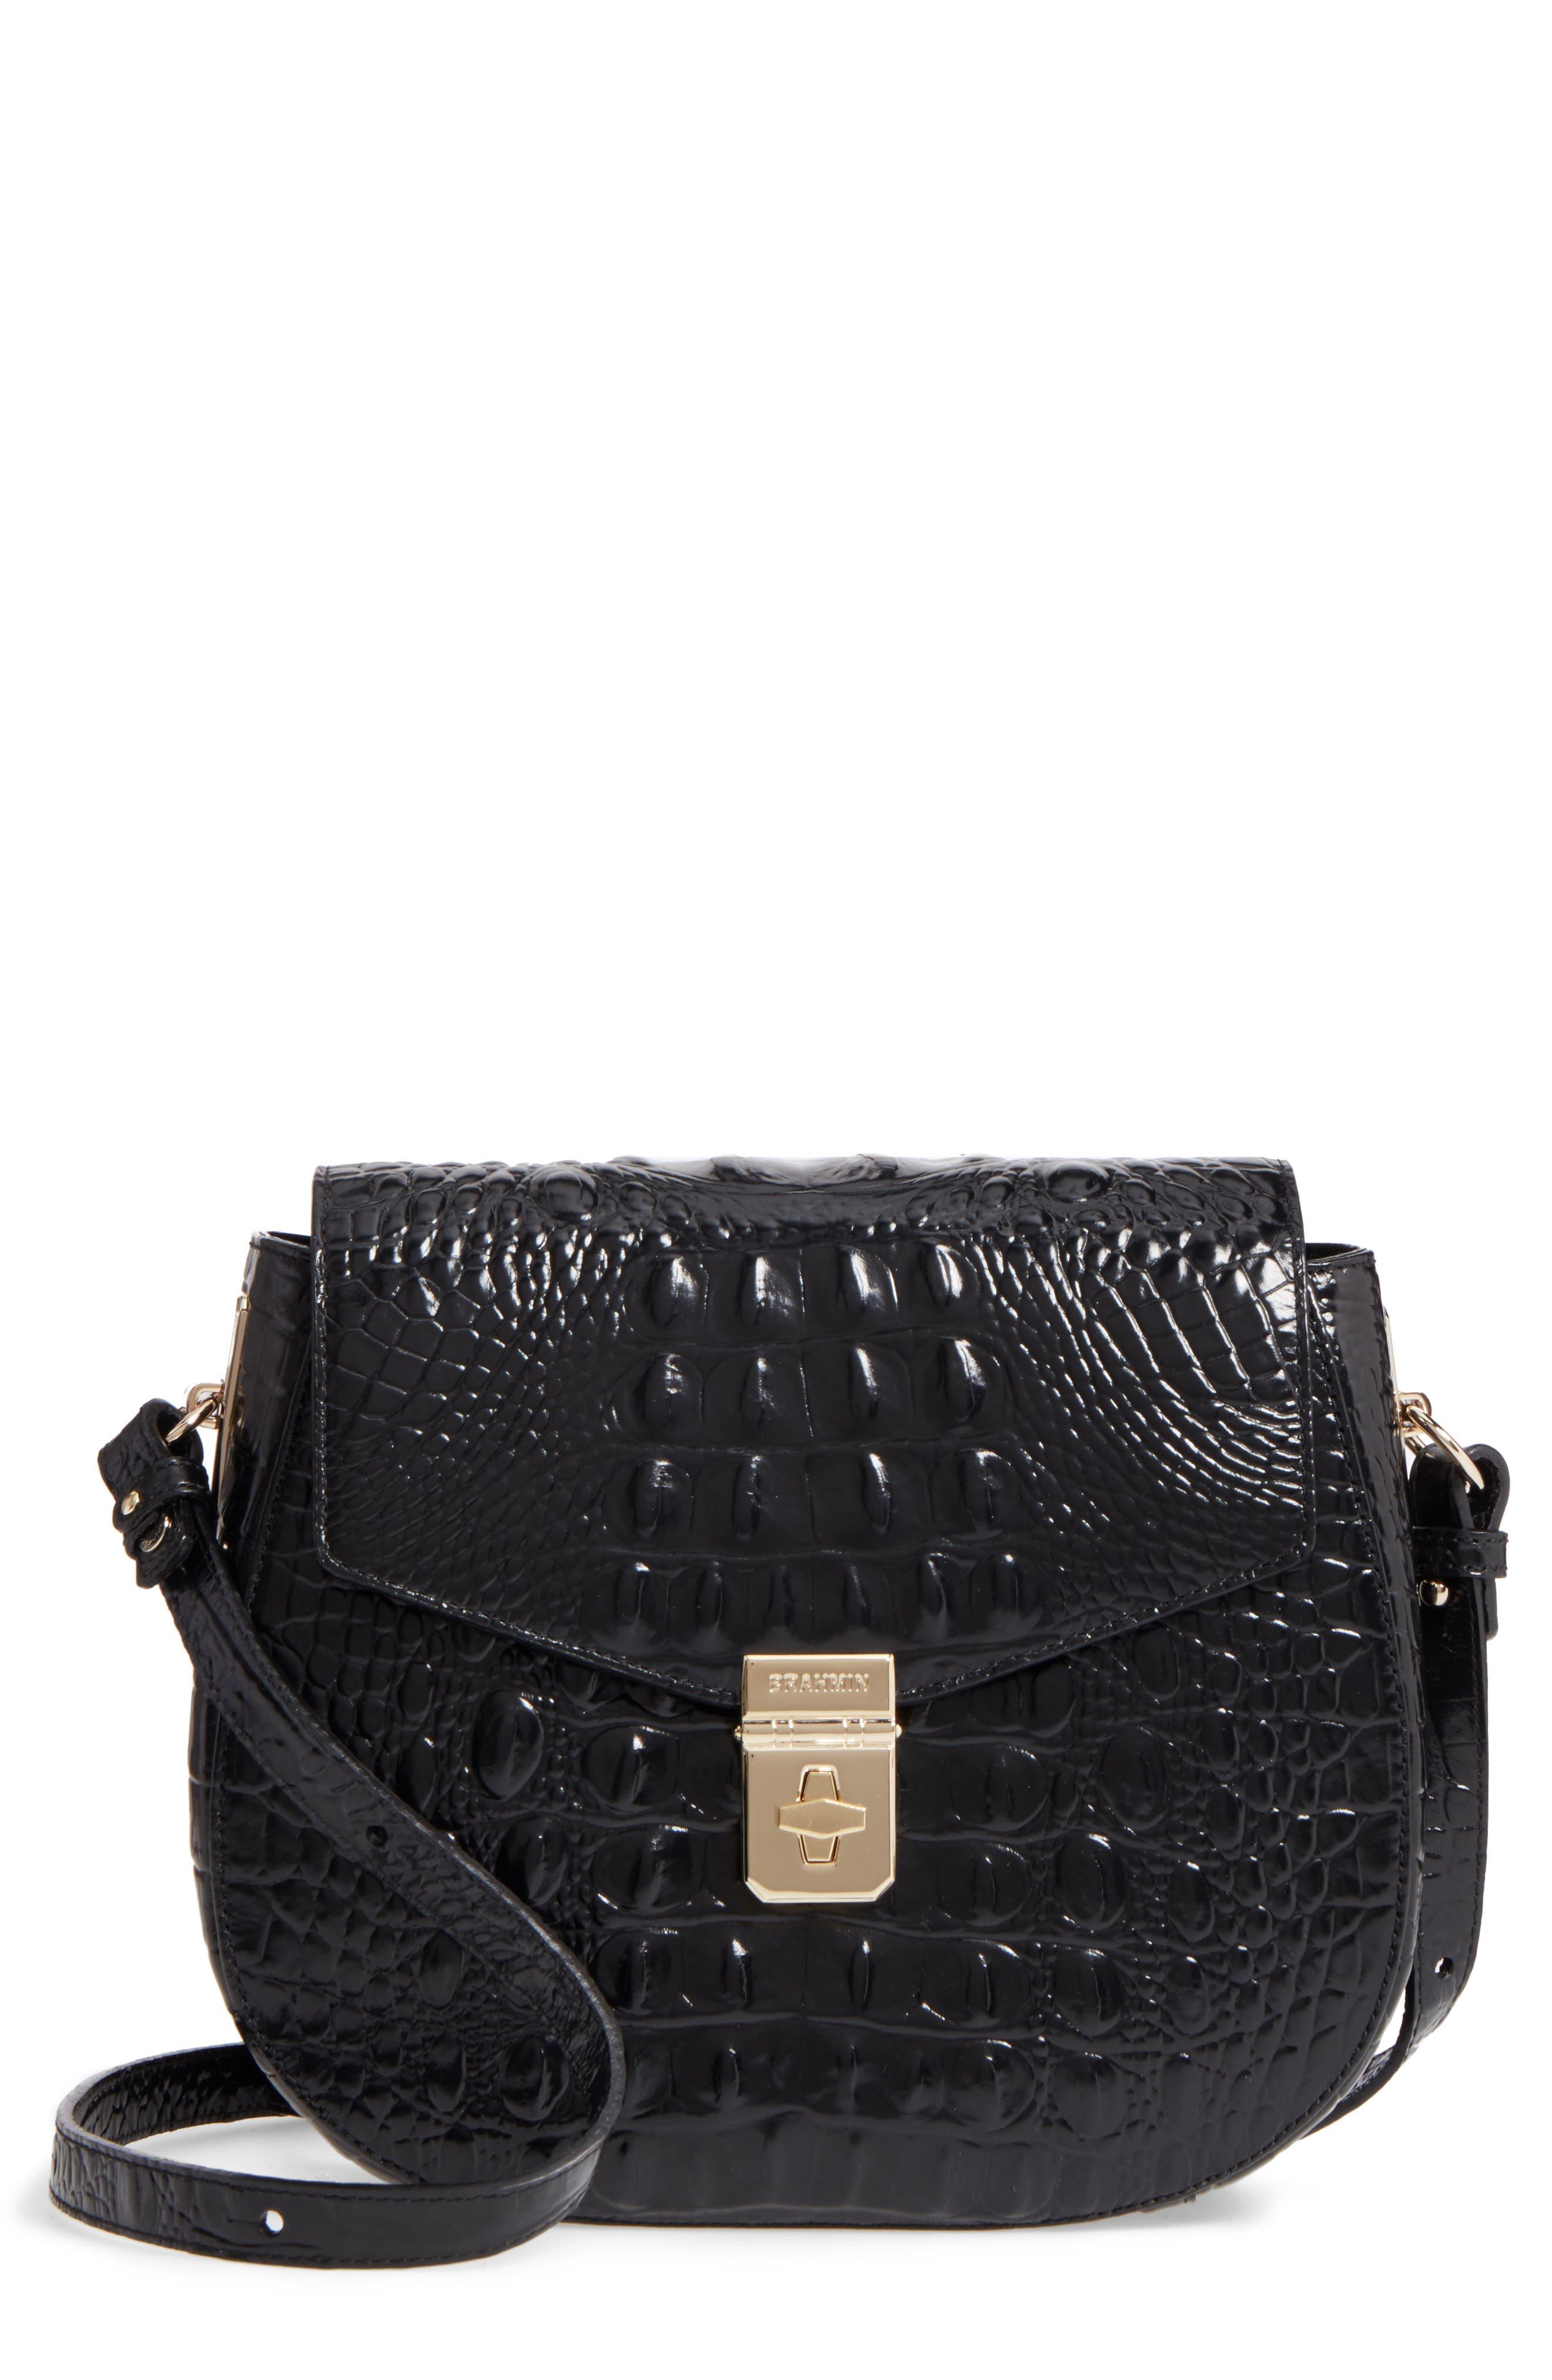 Melbourne - Lizzie Leather Crossbody Bag,                         Main,                         color,